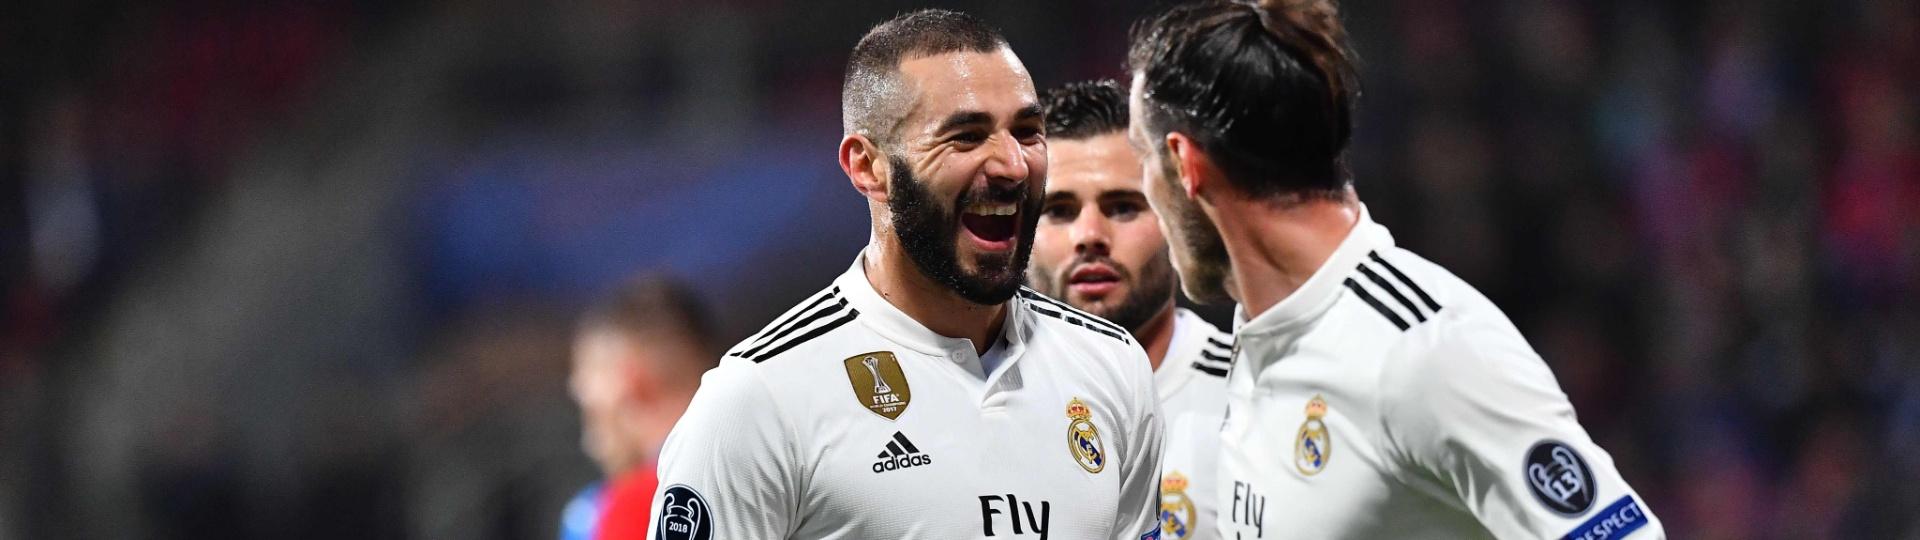 Benzema comemora um de seus gols pelo Real Madrid contra o Viktoria Plzen na Champions